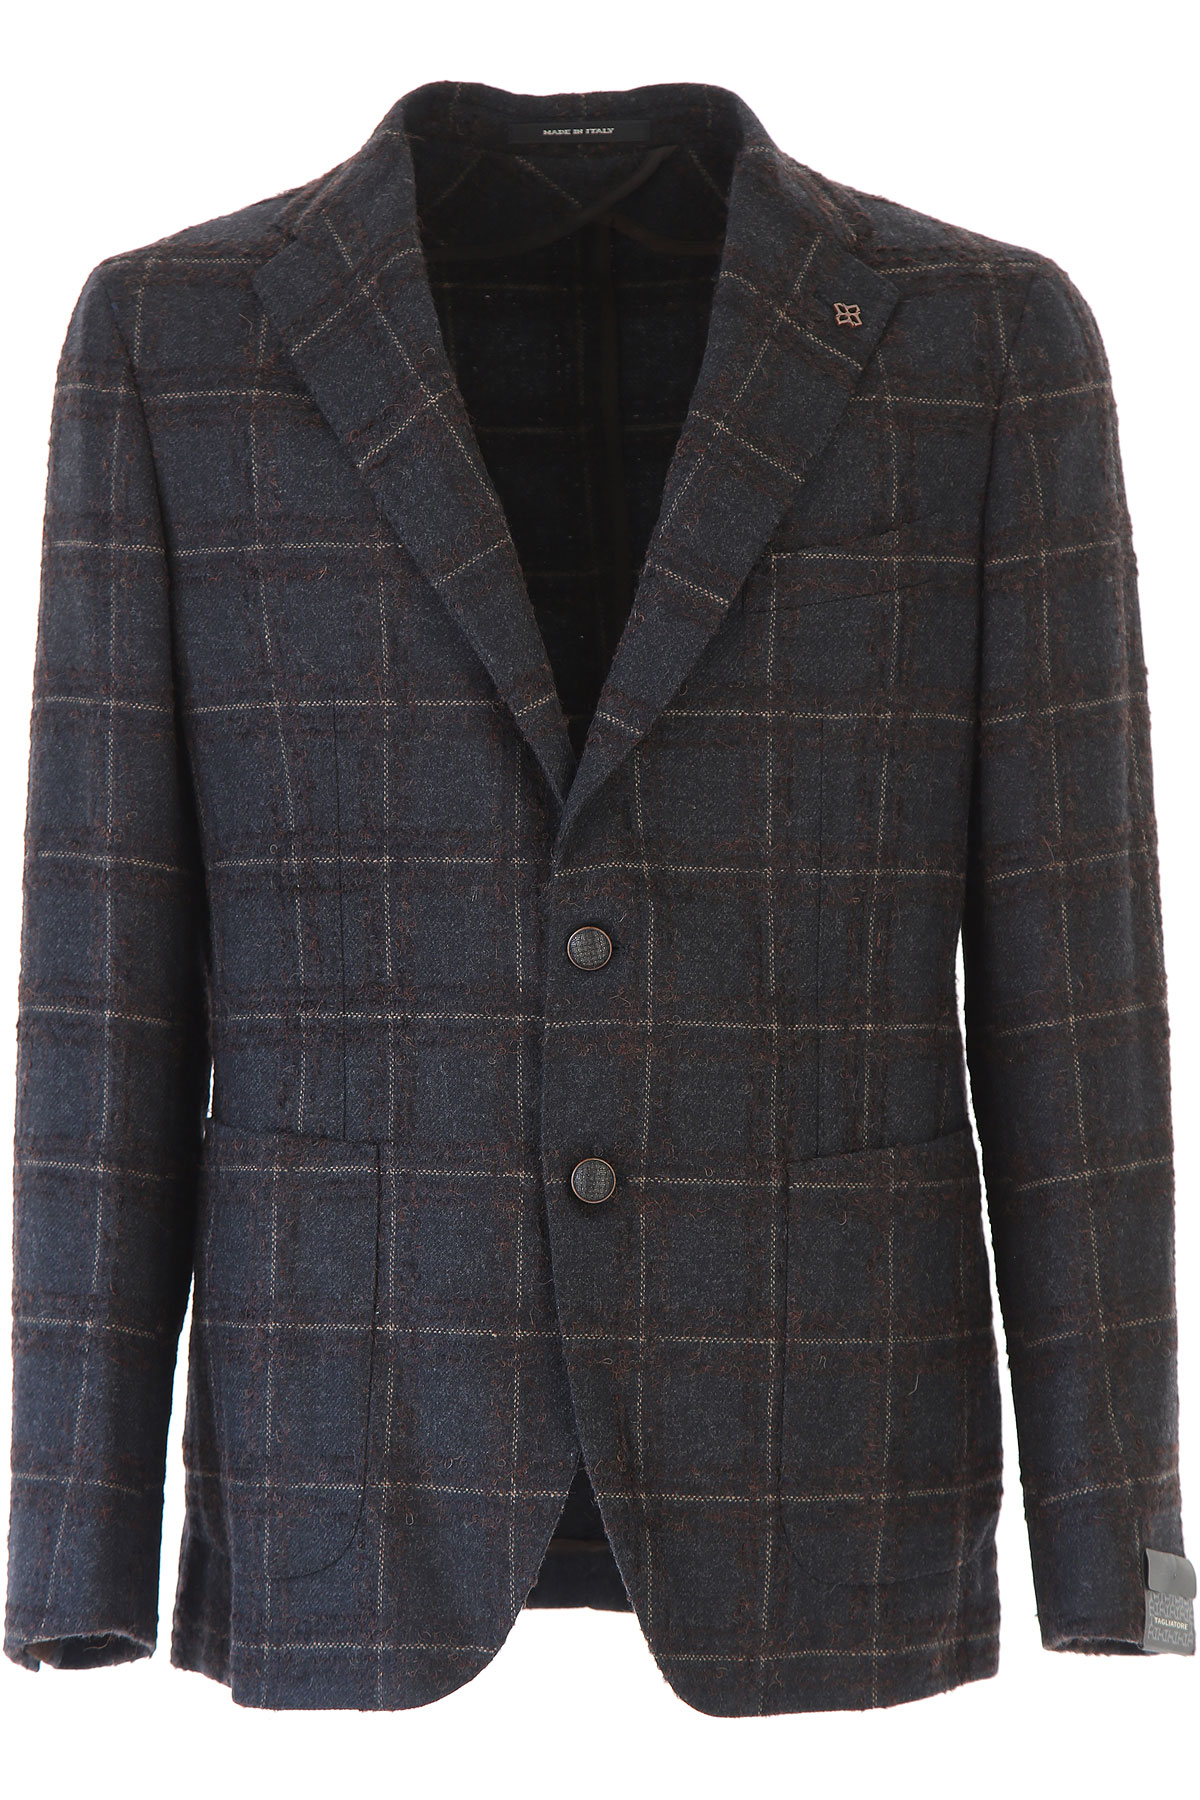 Image of Tagliatore Blazer for Men, Sport Coat, Lead, Virgin wool, 2017, L M XL